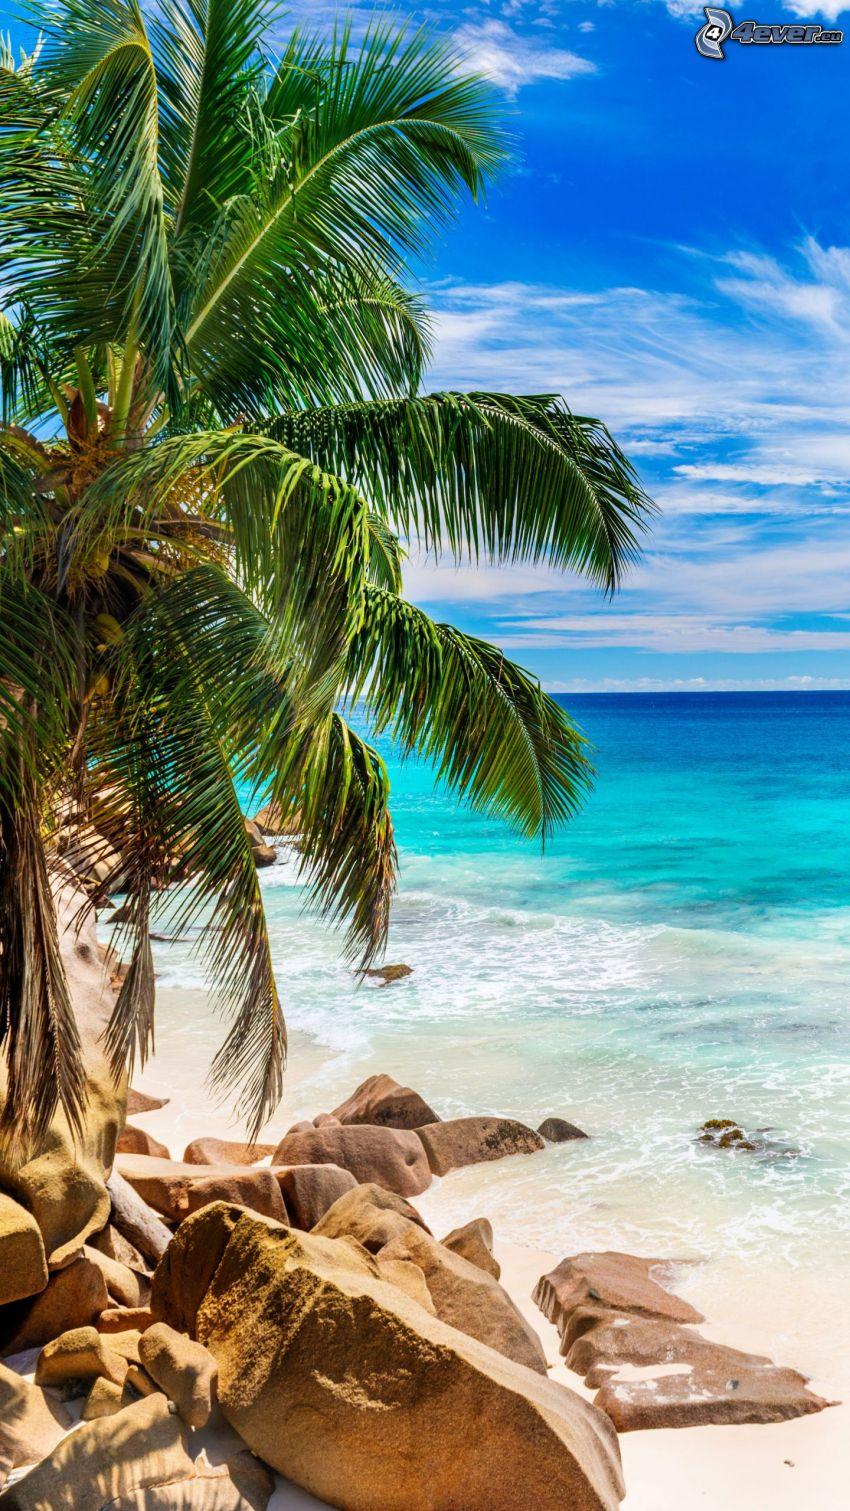 côte, rochers, palmier, ouvert mer